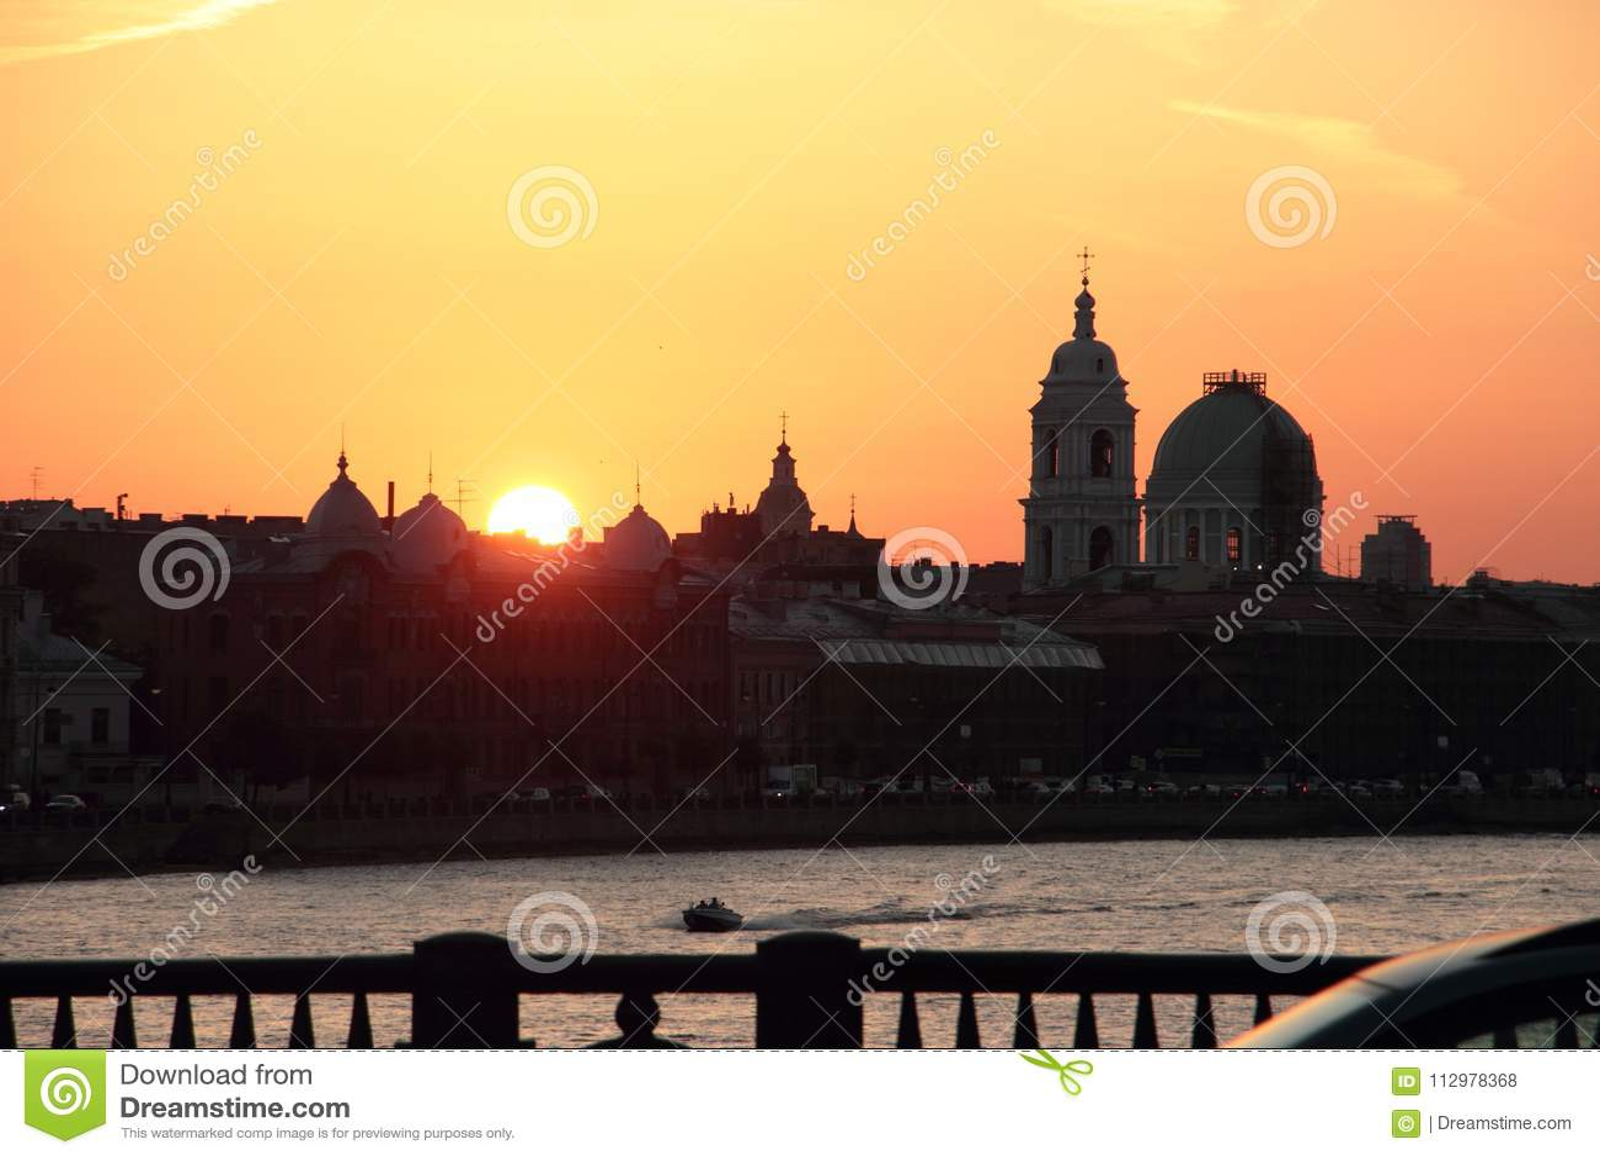 St. Petersburg, Neva River, Sunset